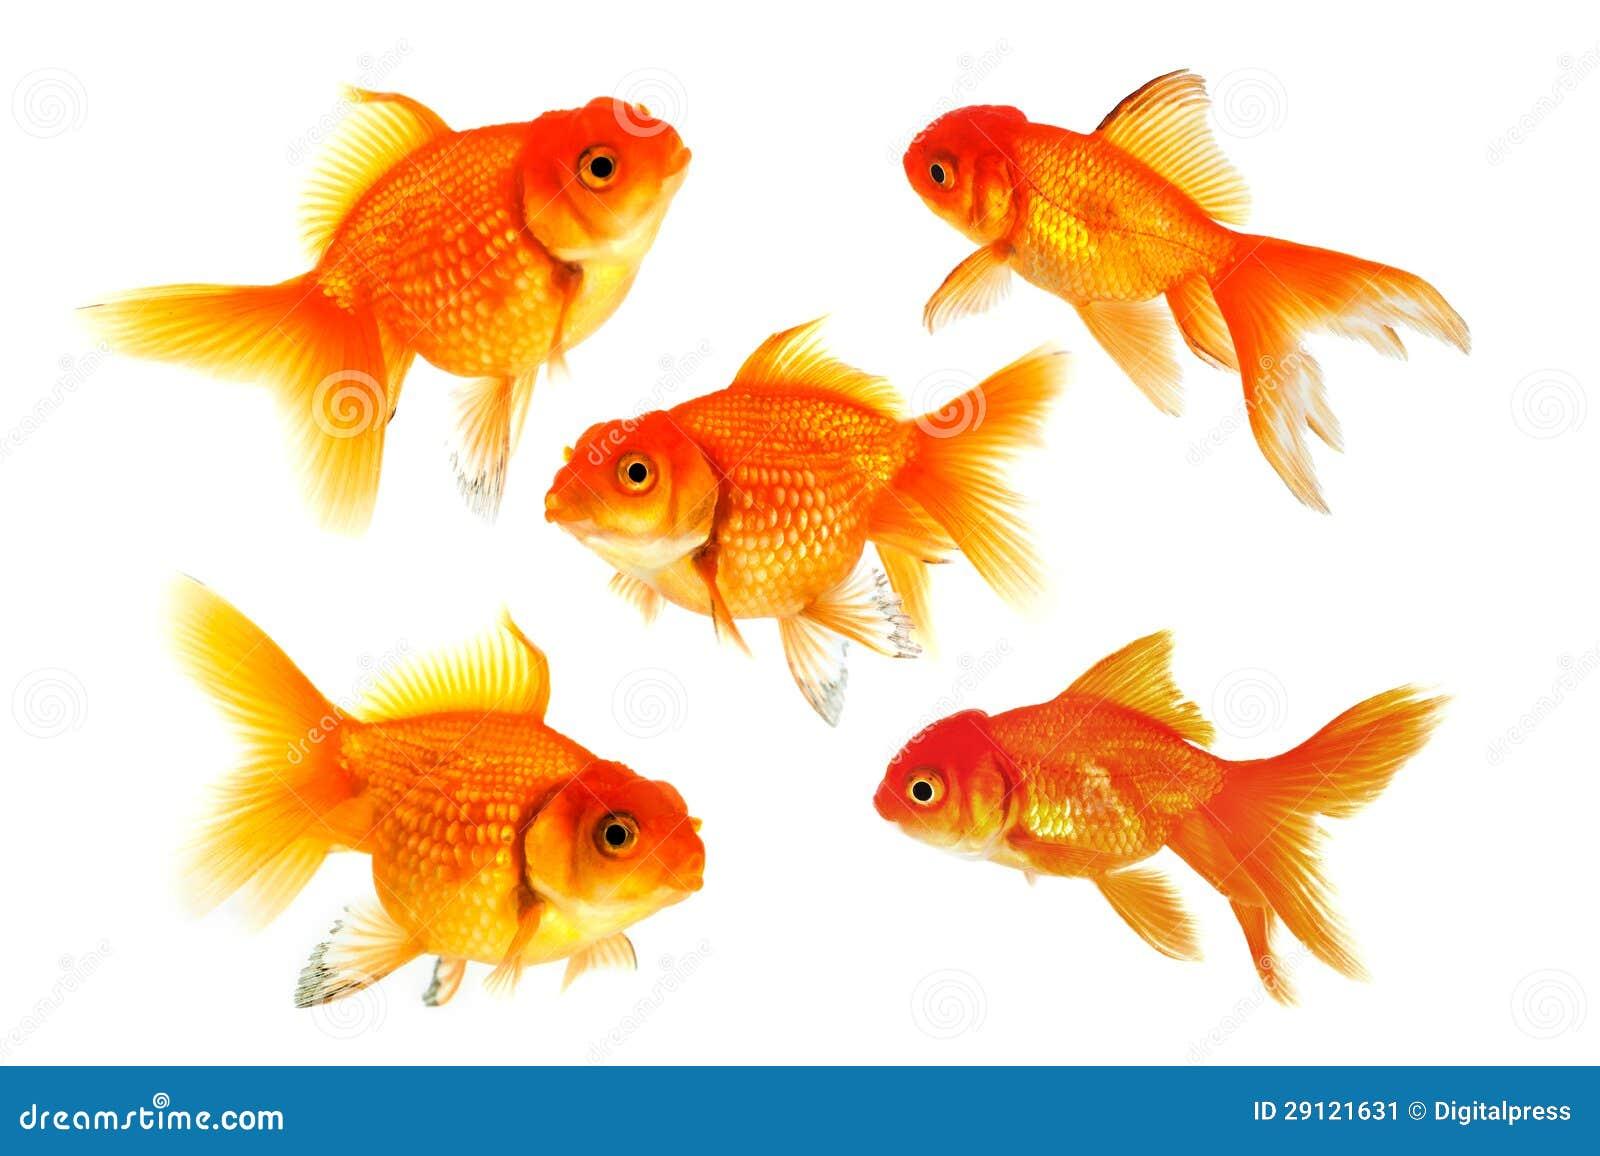 Groupe du poisson rouge image stock image 29121631 for Achat poisson rouge lyon